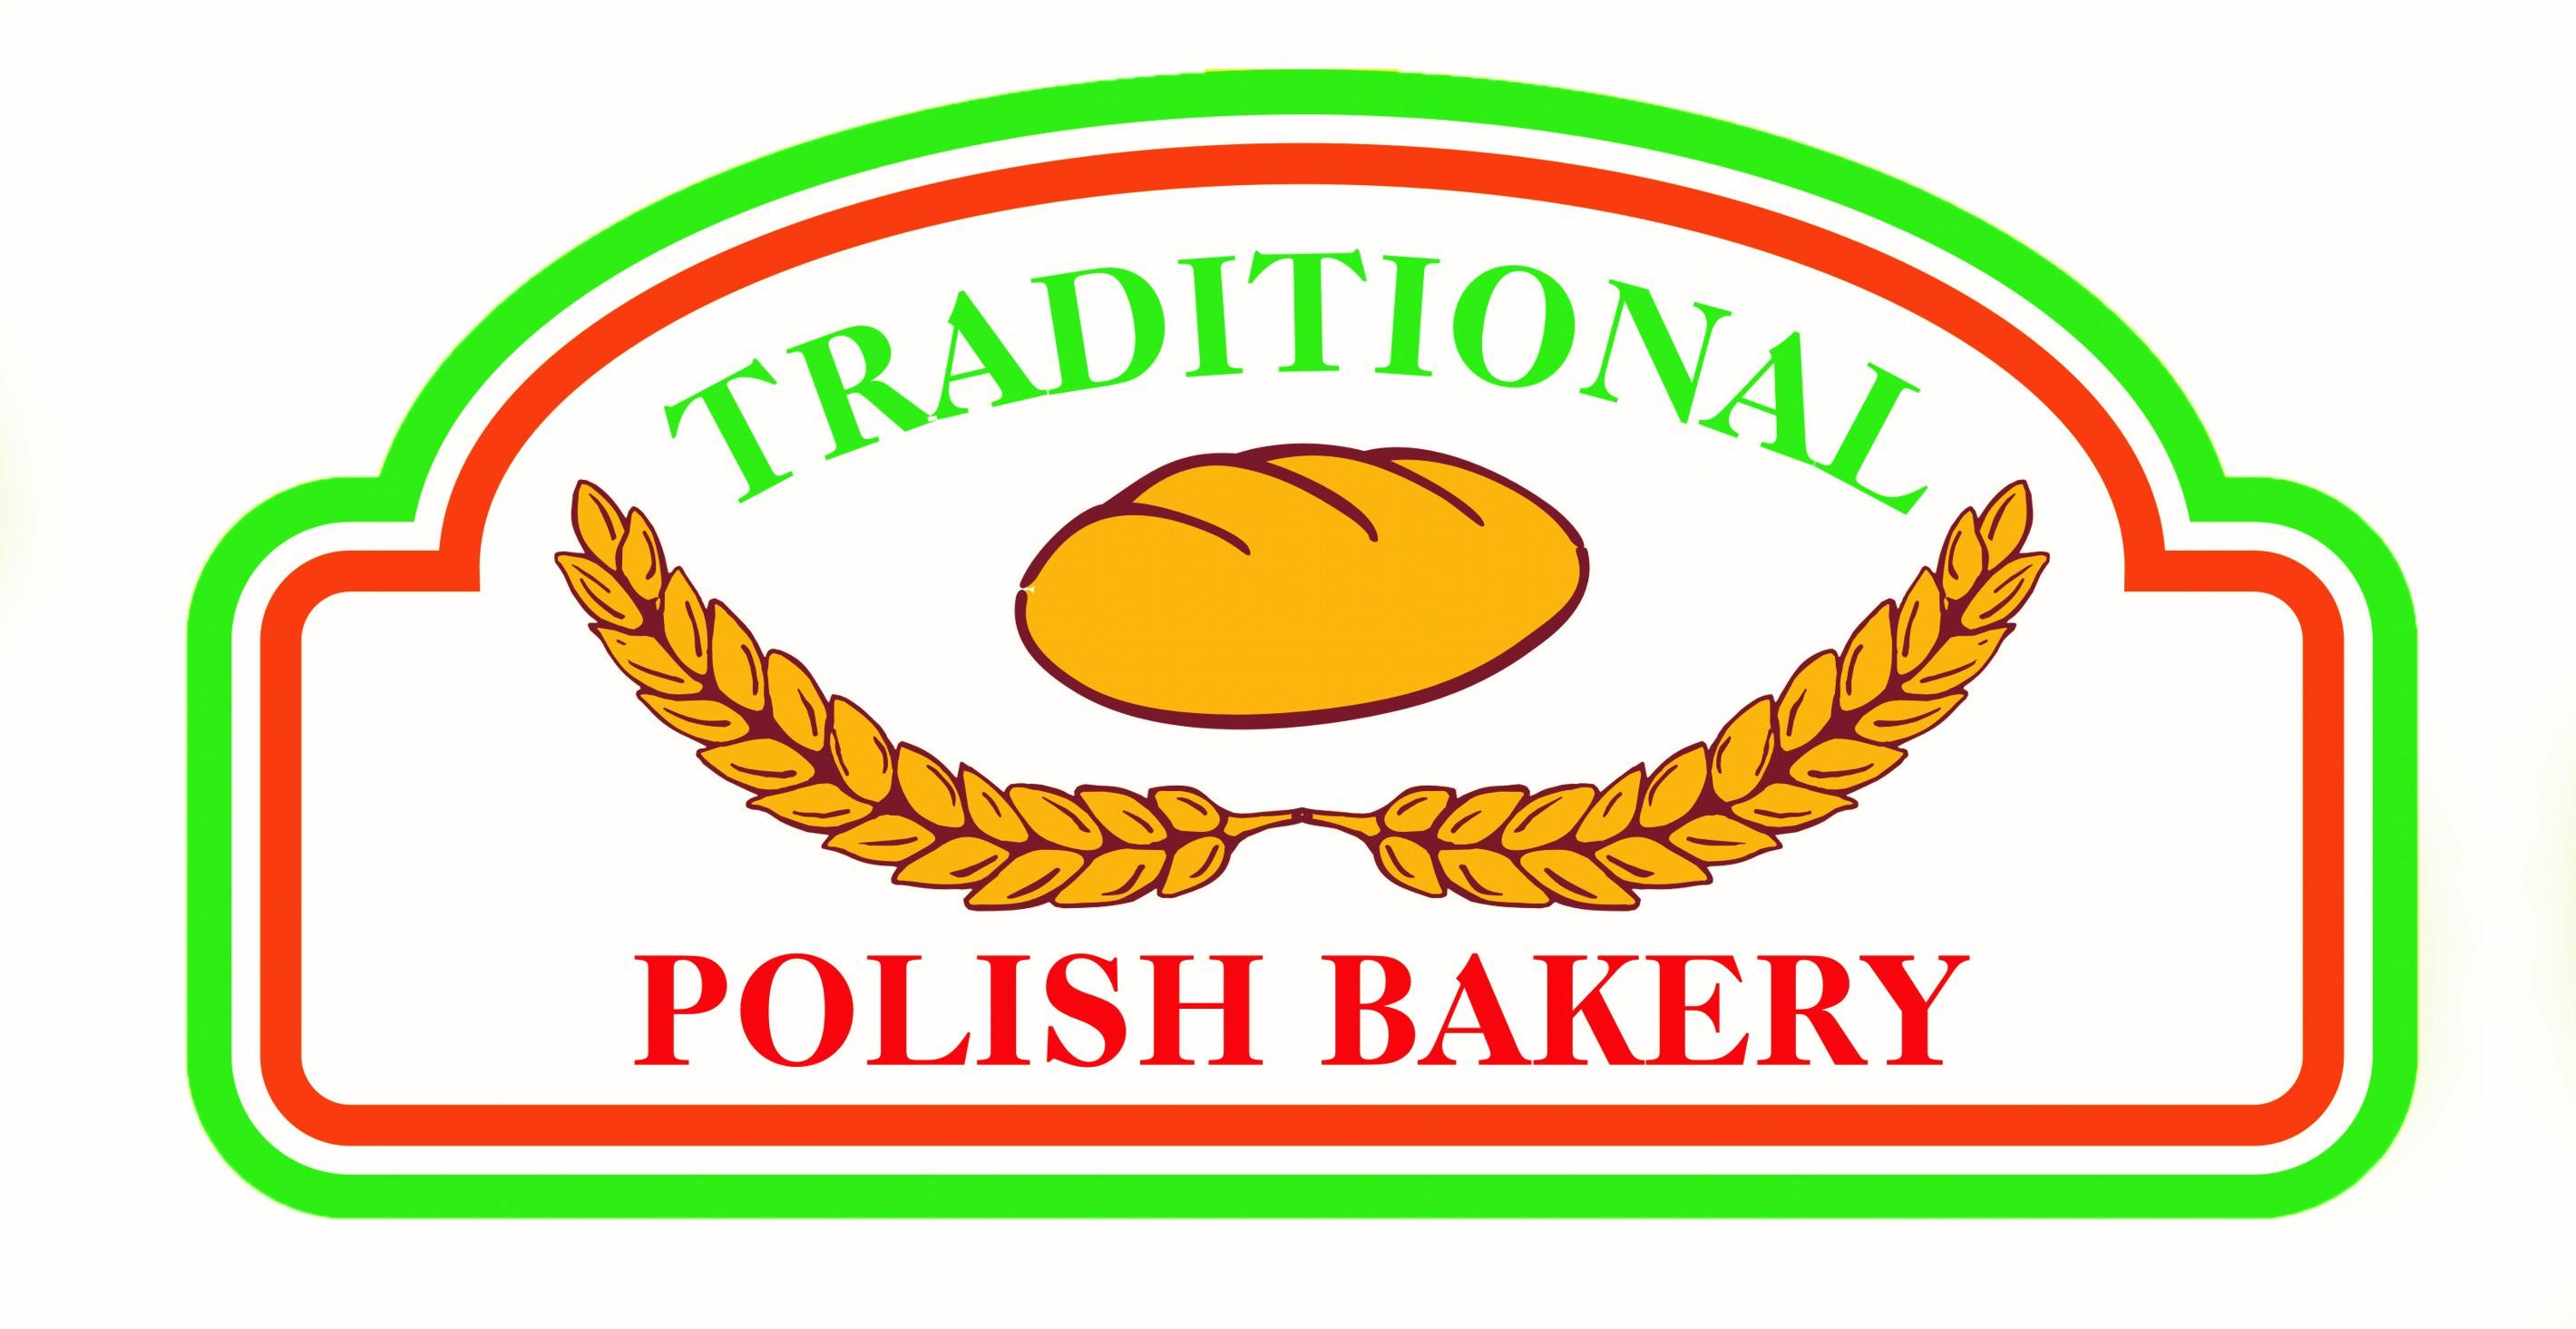 PolishBakery